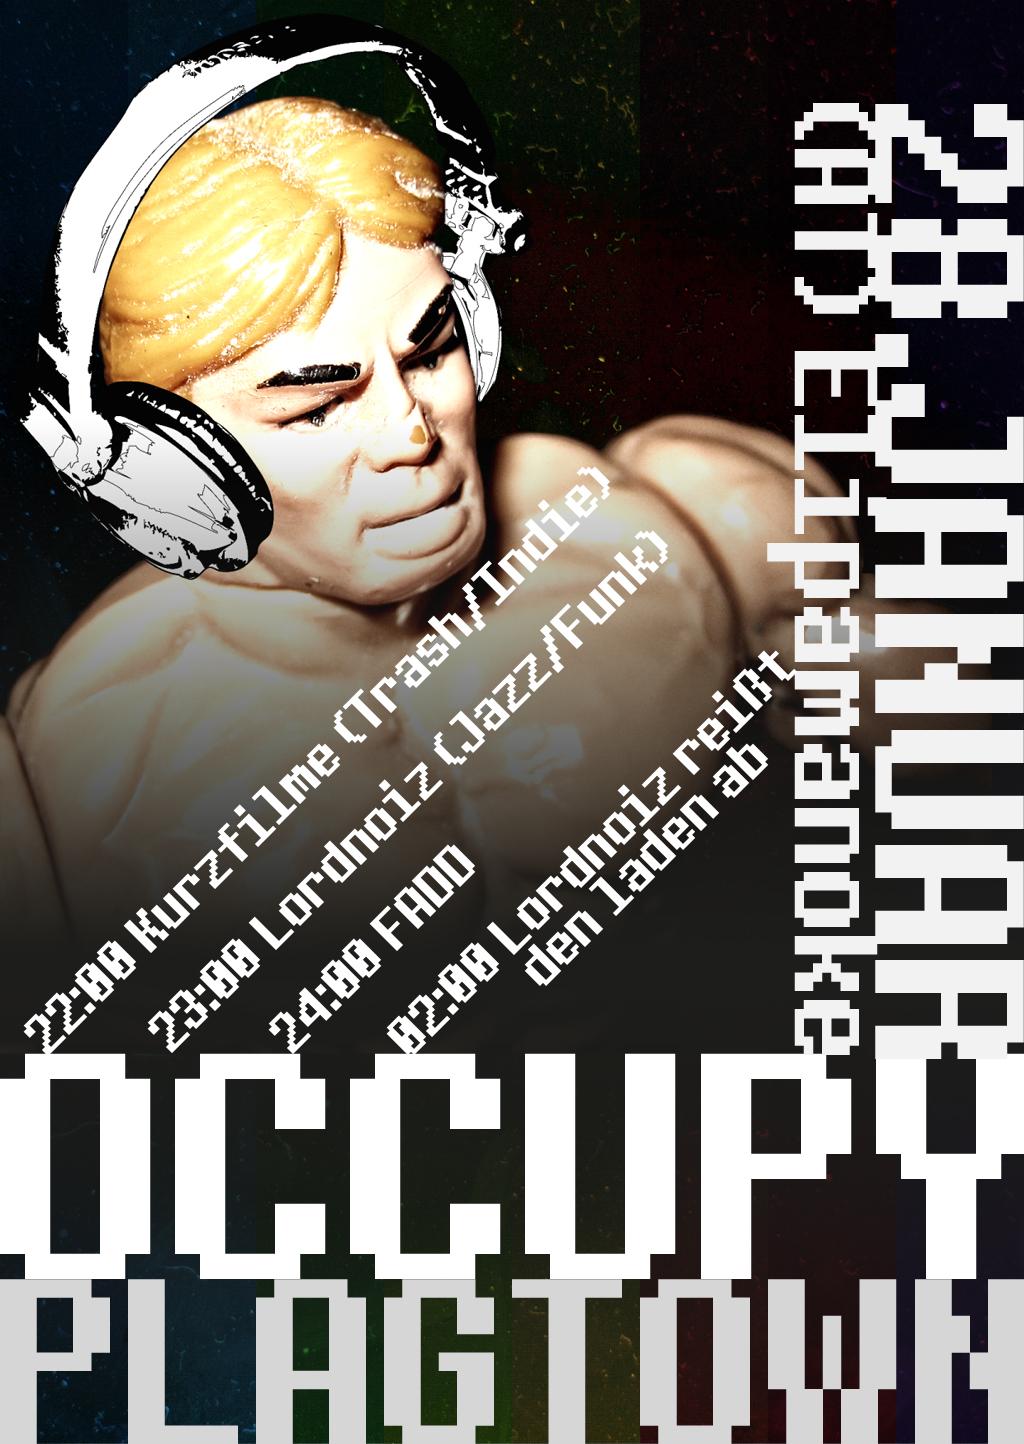 Occupy Plagtown